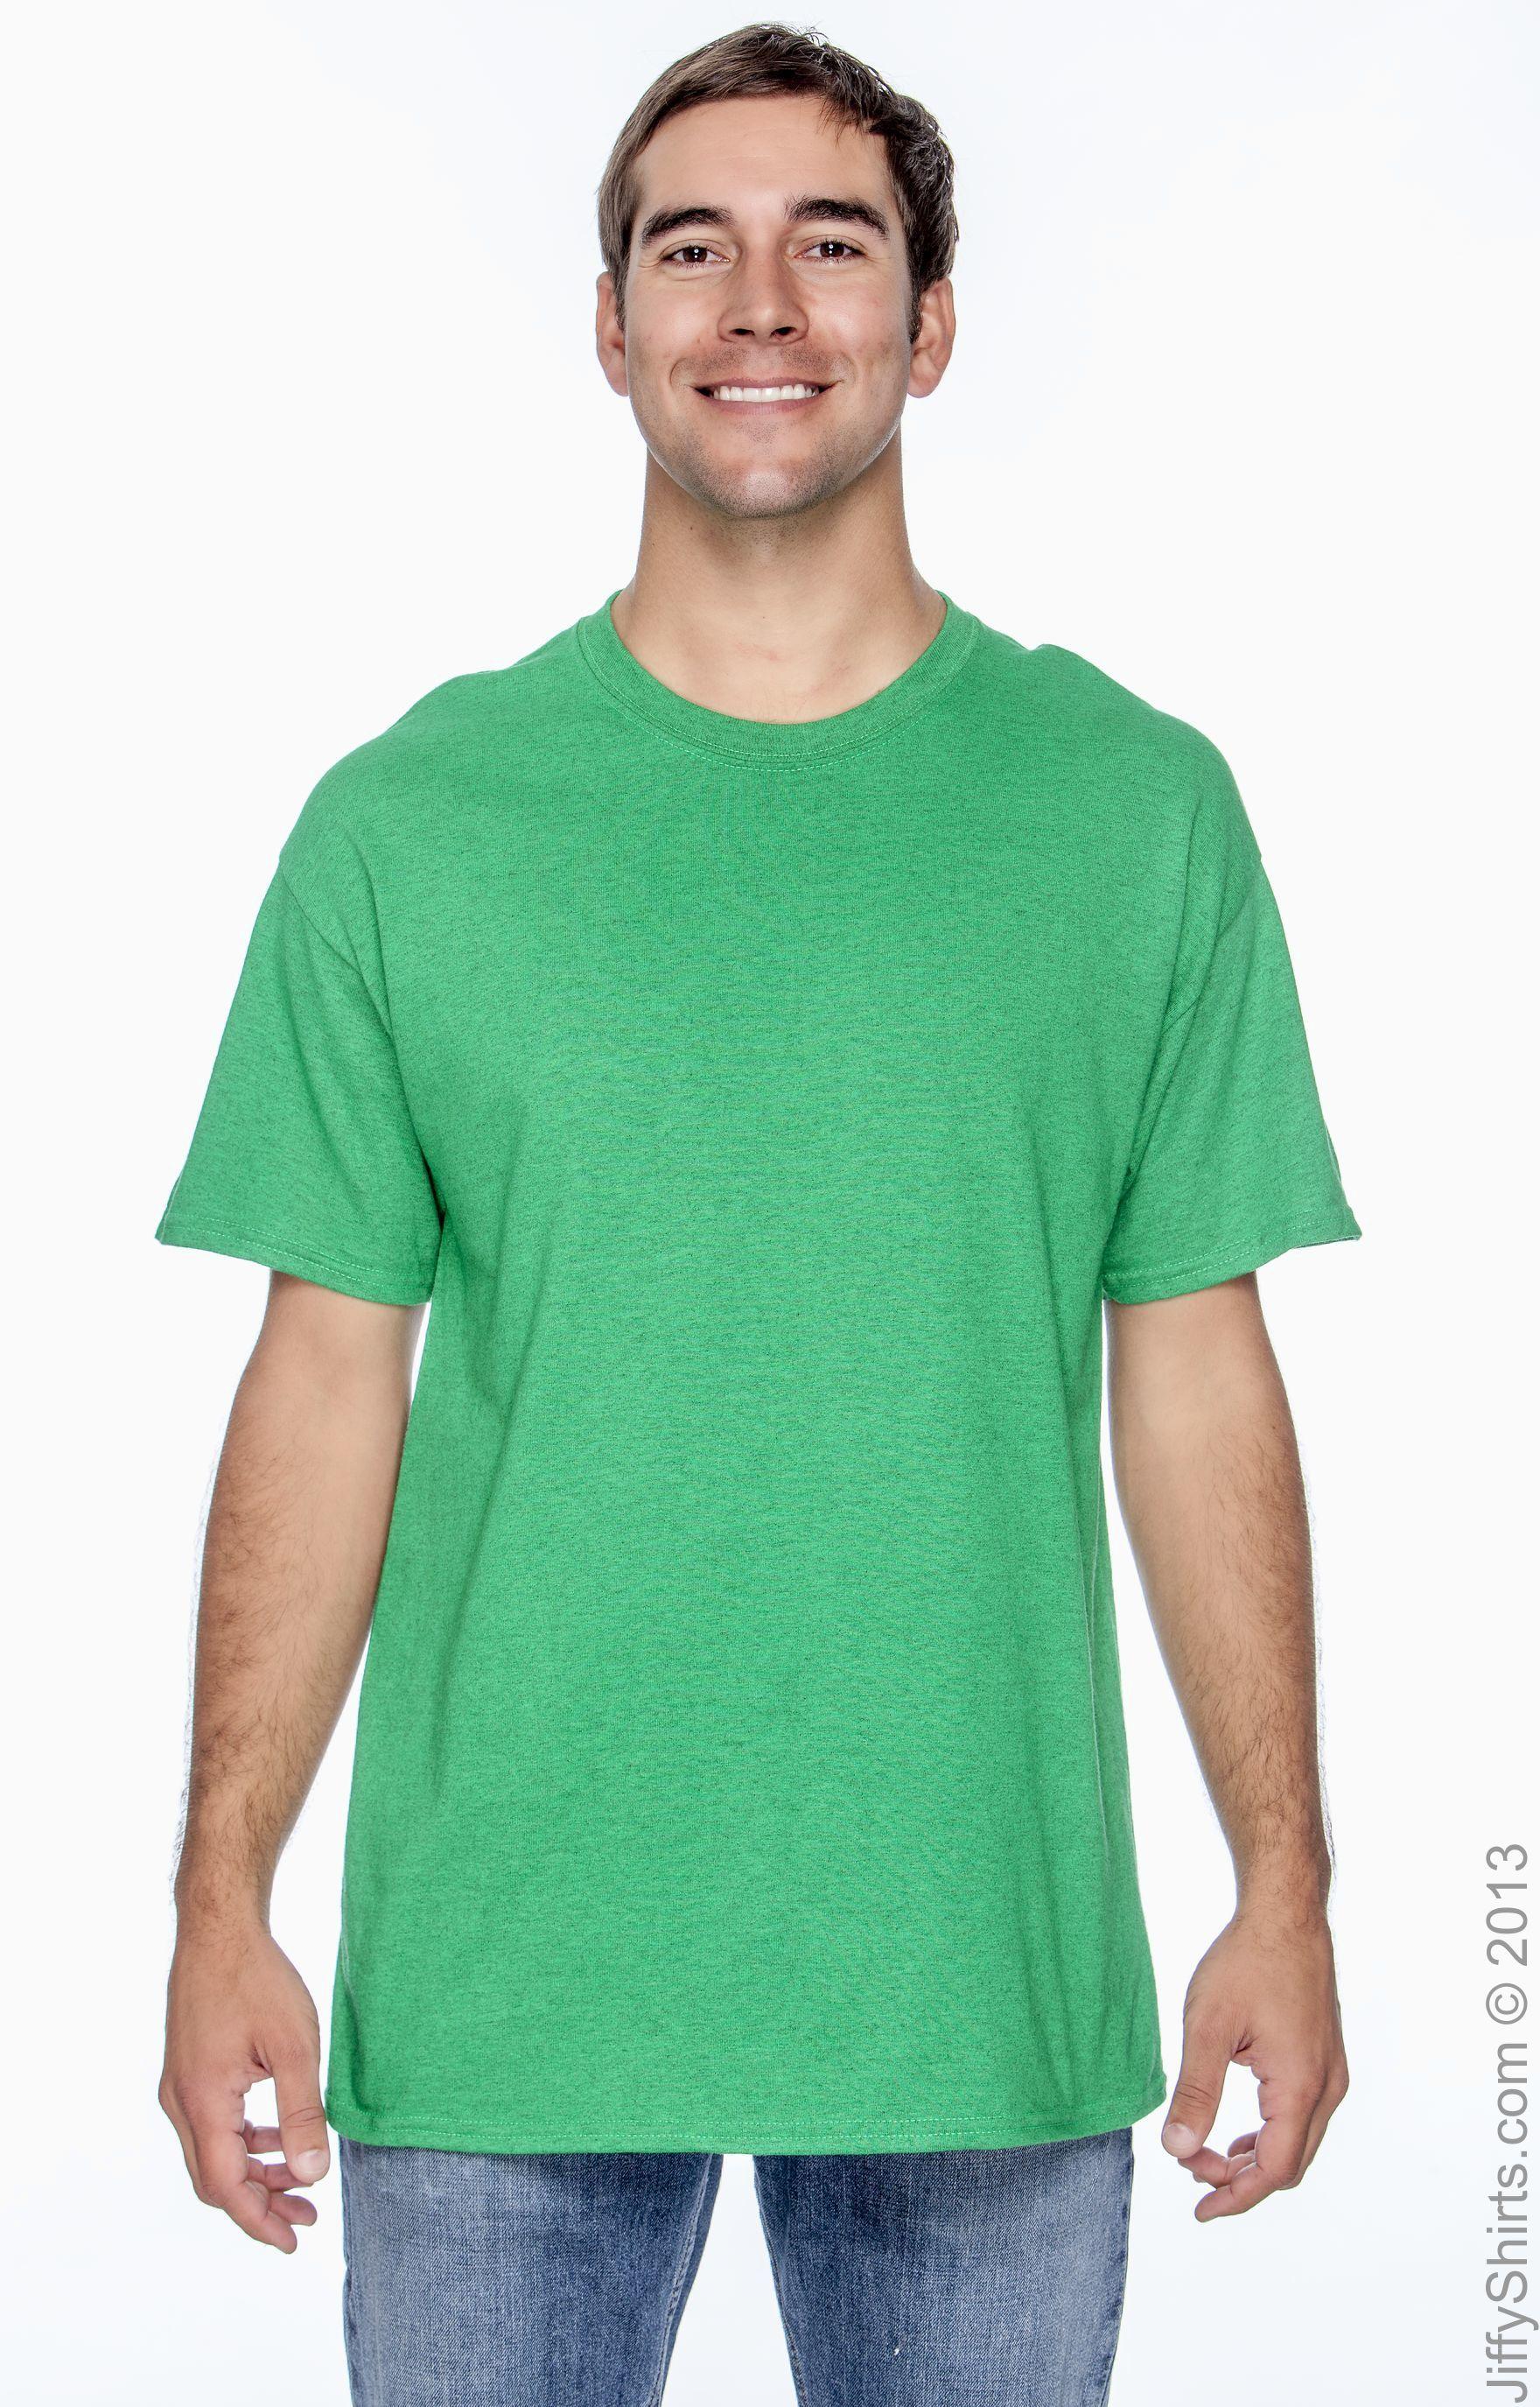 5XL - Teal By Hanes Mens 61 Oz Tagless T-Shirt Style # 5250T - Original Label